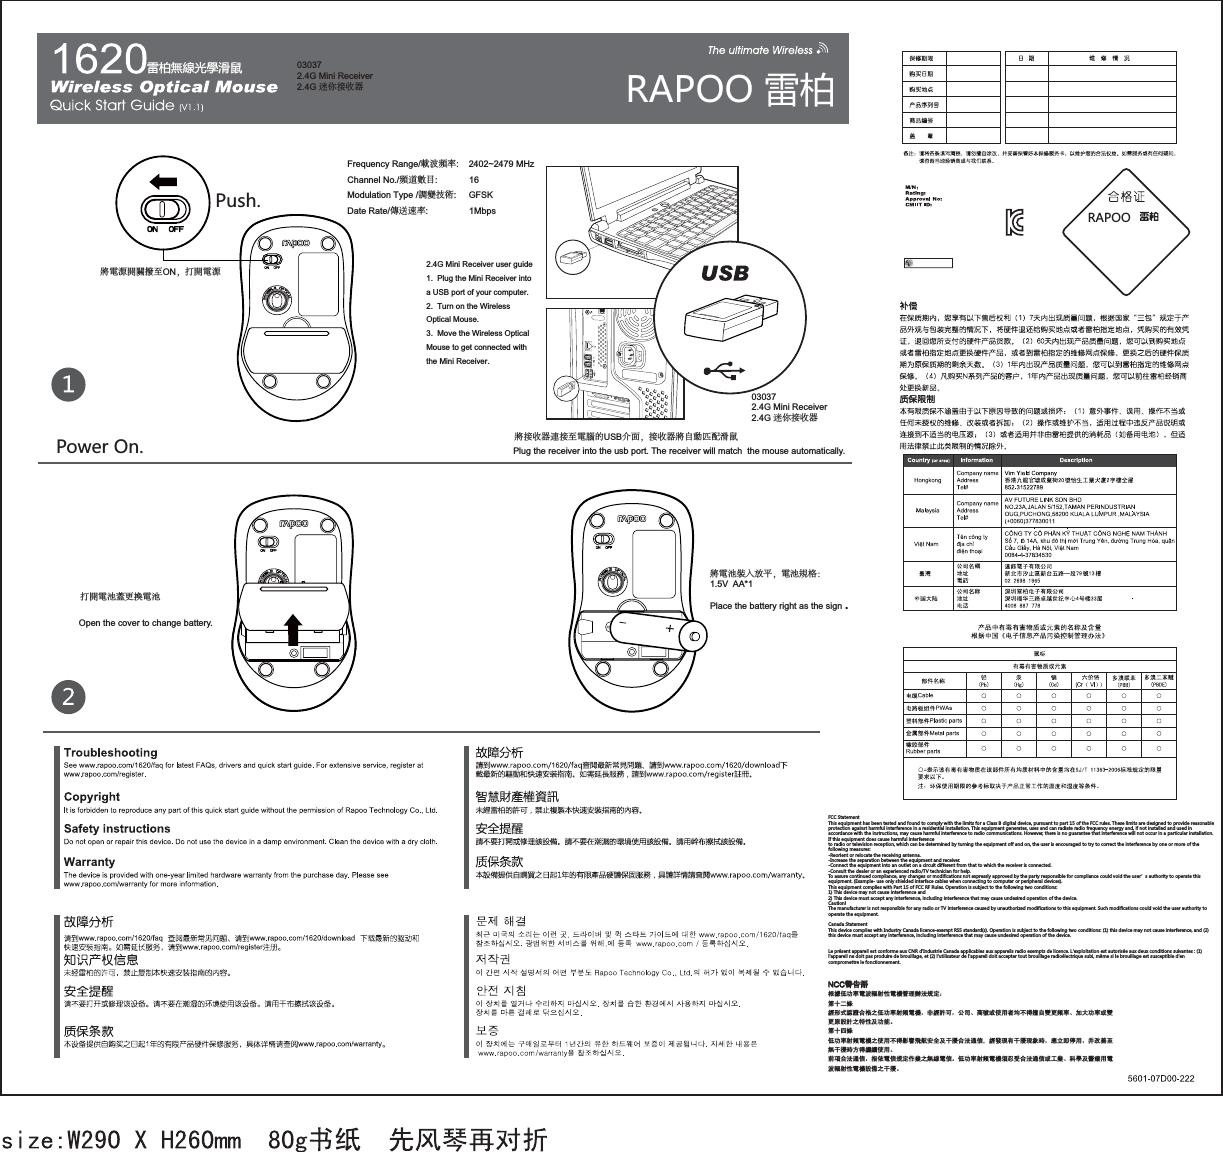 Rapoo Technology I 2 4g Mini Receiver User Manual